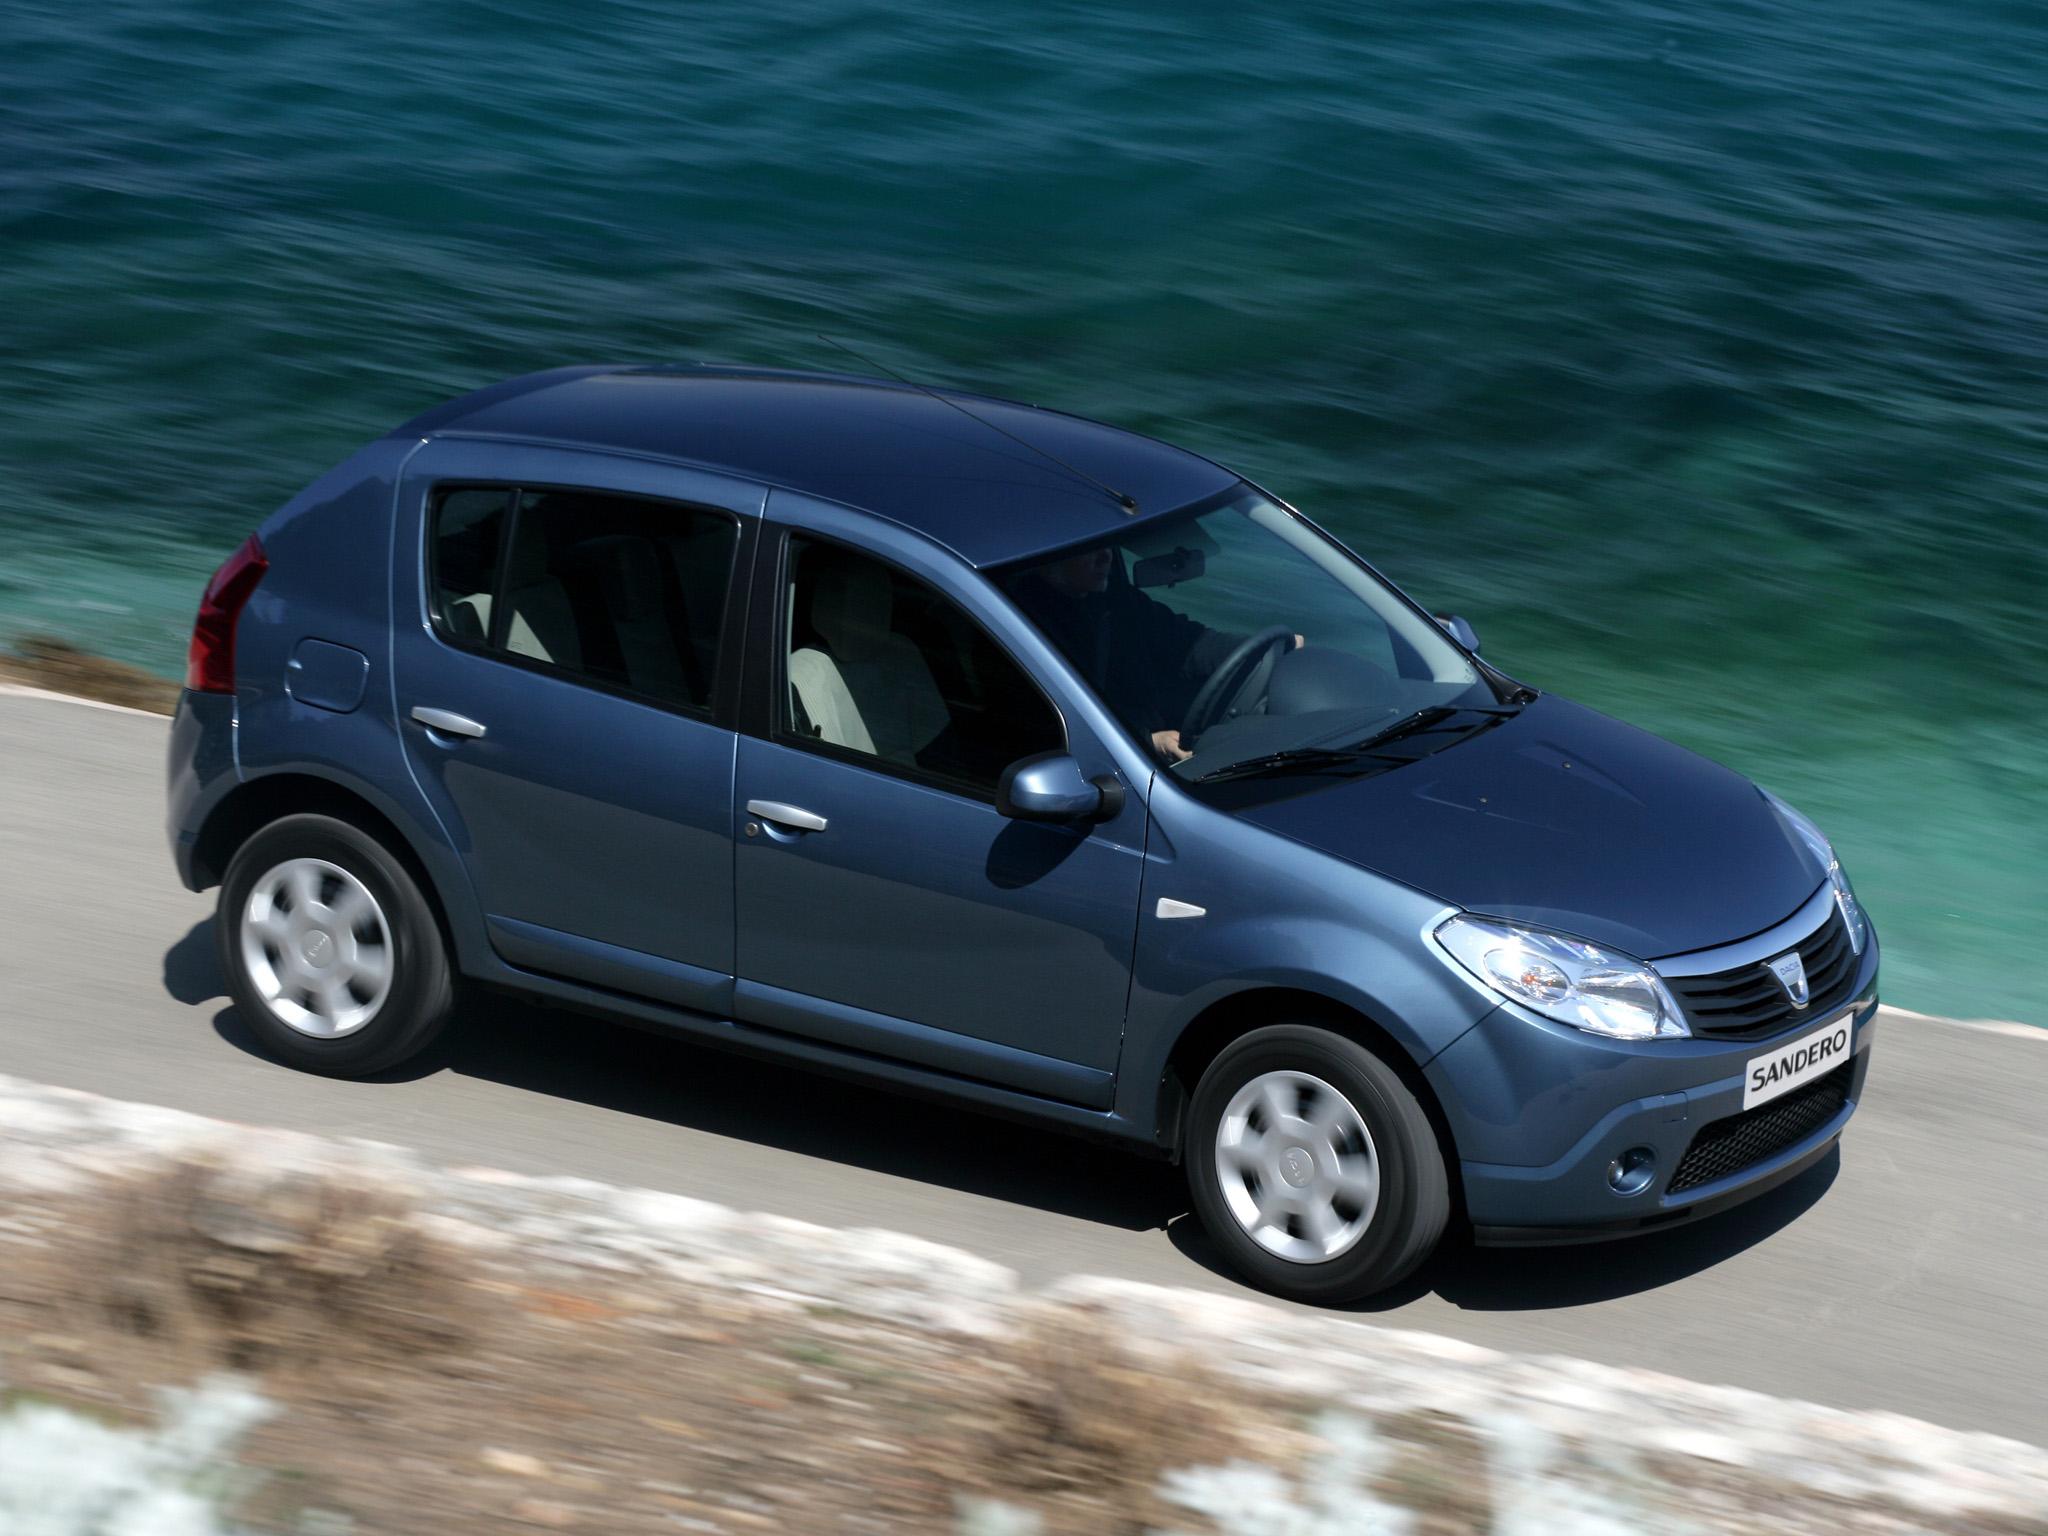 Dacia Sandero - Autovisie.nl